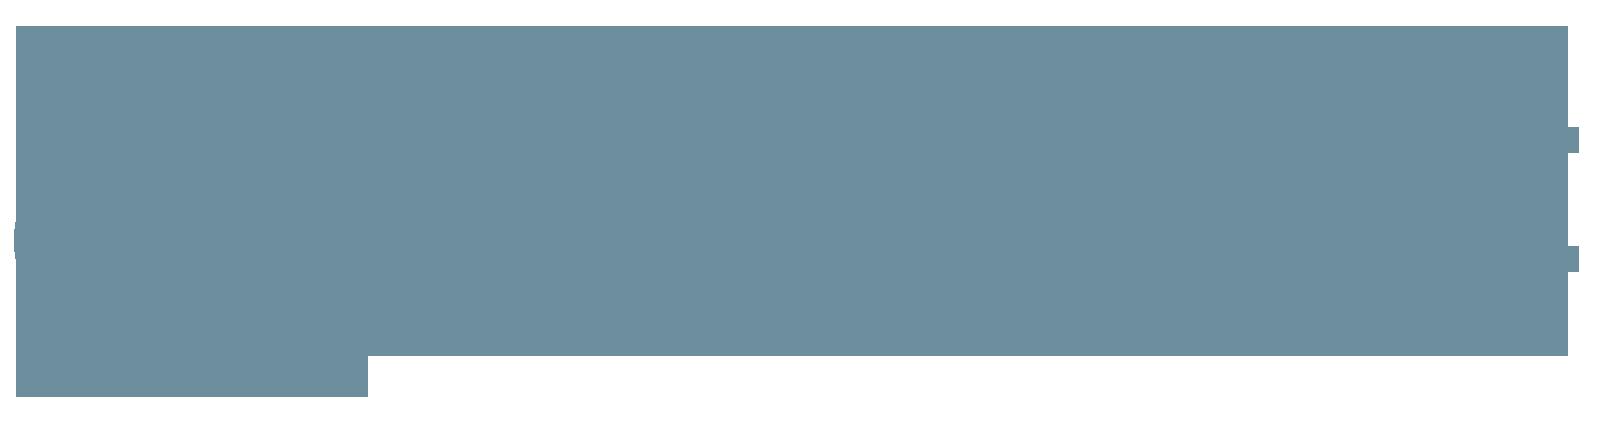 freshdesk-logo-blue.png